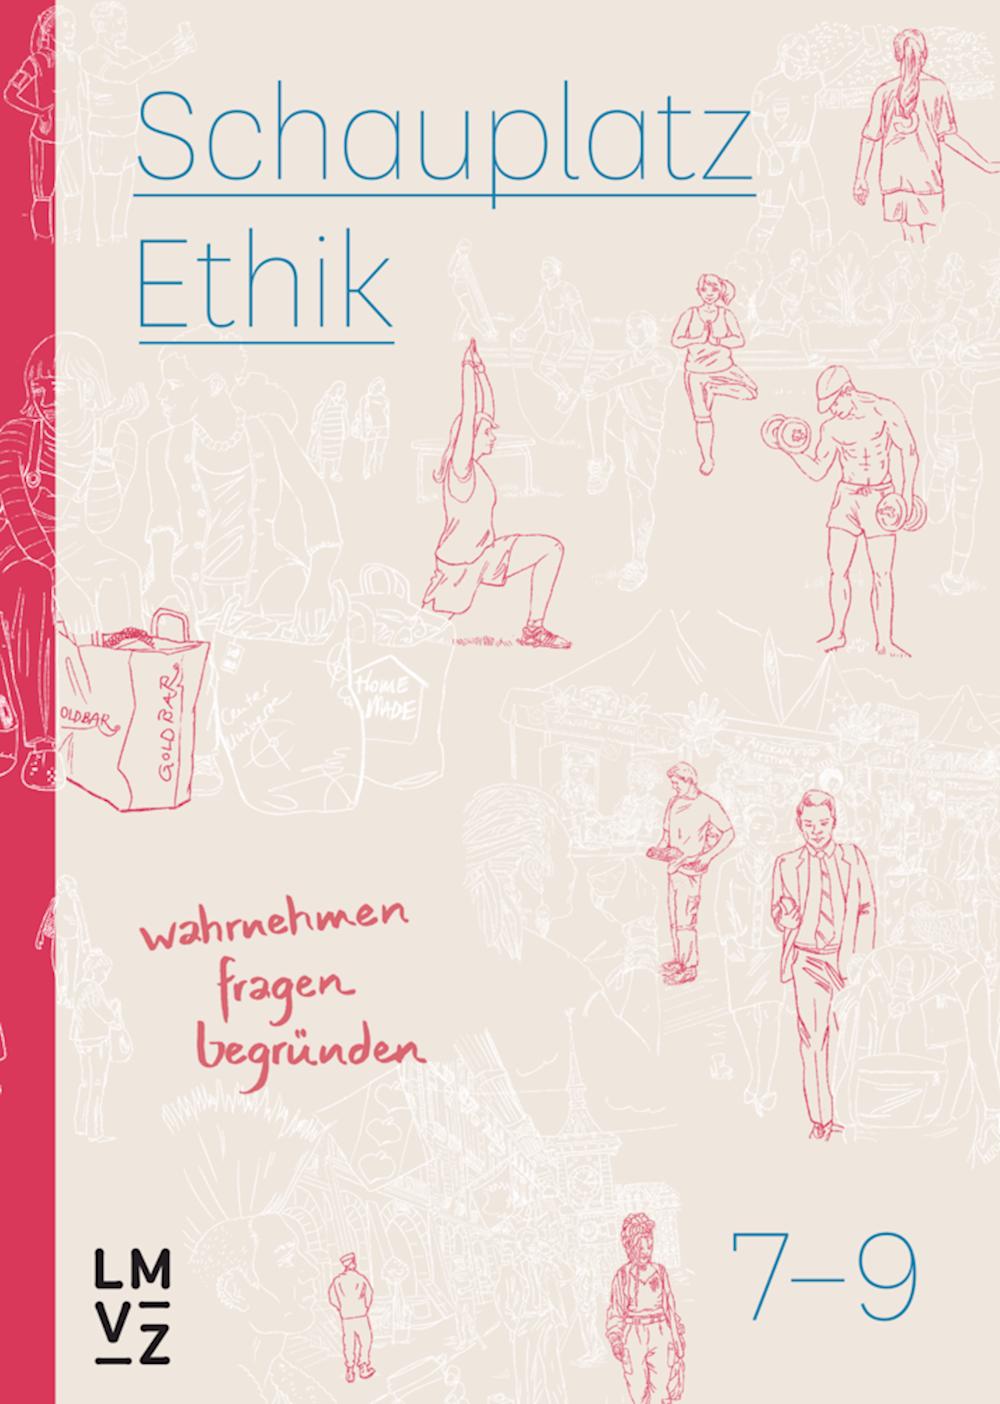 Preview image for LOM object Schauplatz Ethik 7-9